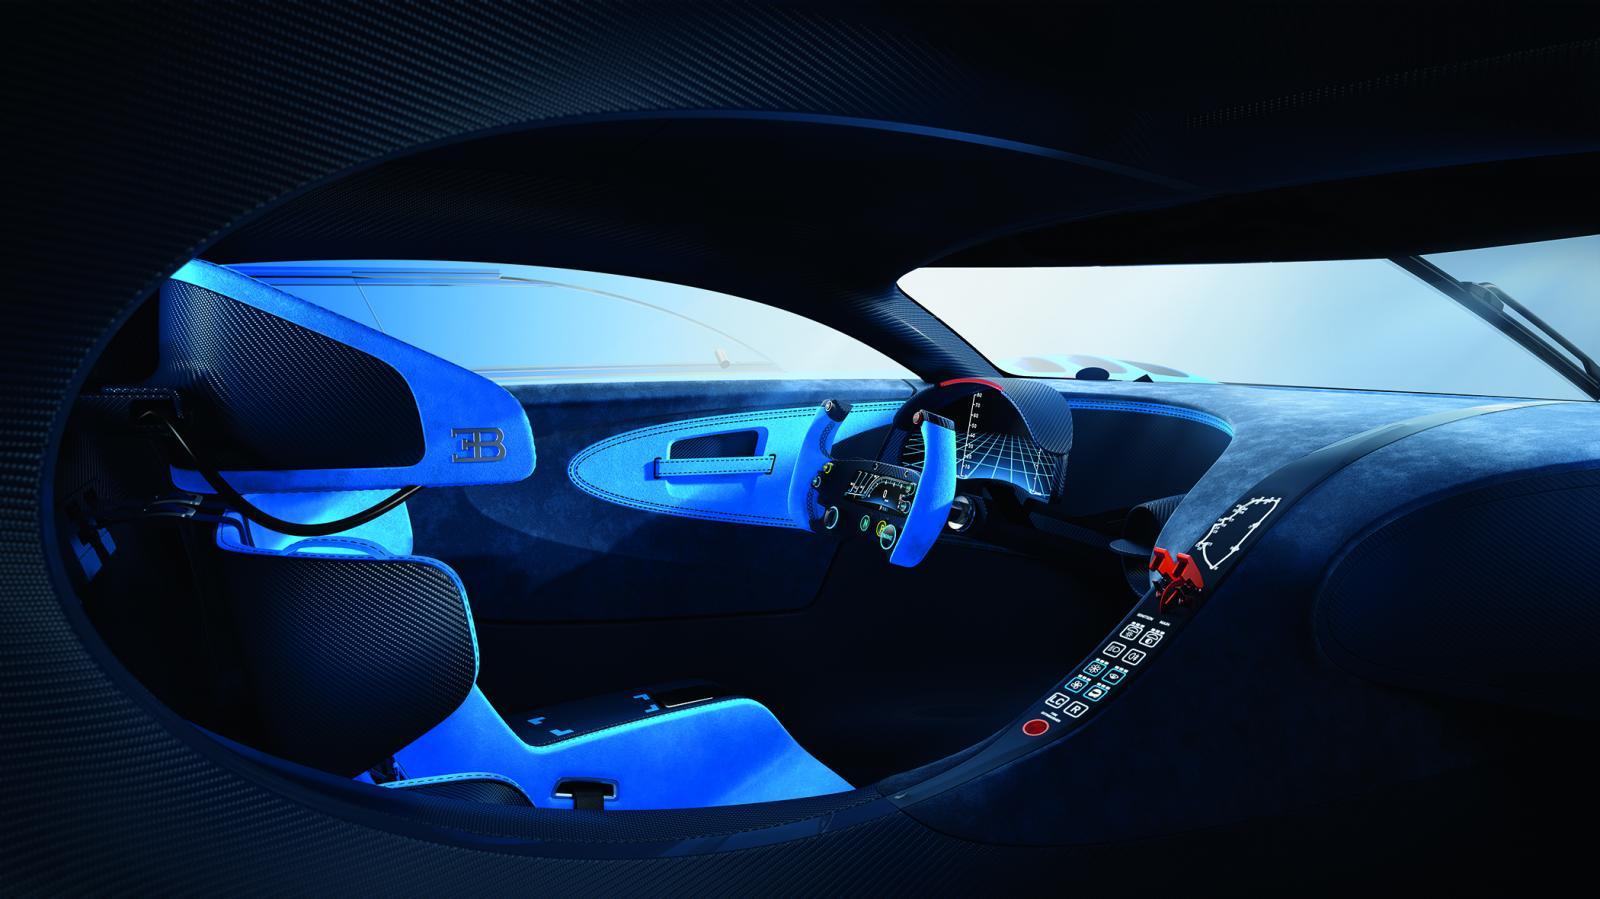 2015 bugatti vision gran turismo concept 5 egmcartech. Black Bedroom Furniture Sets. Home Design Ideas